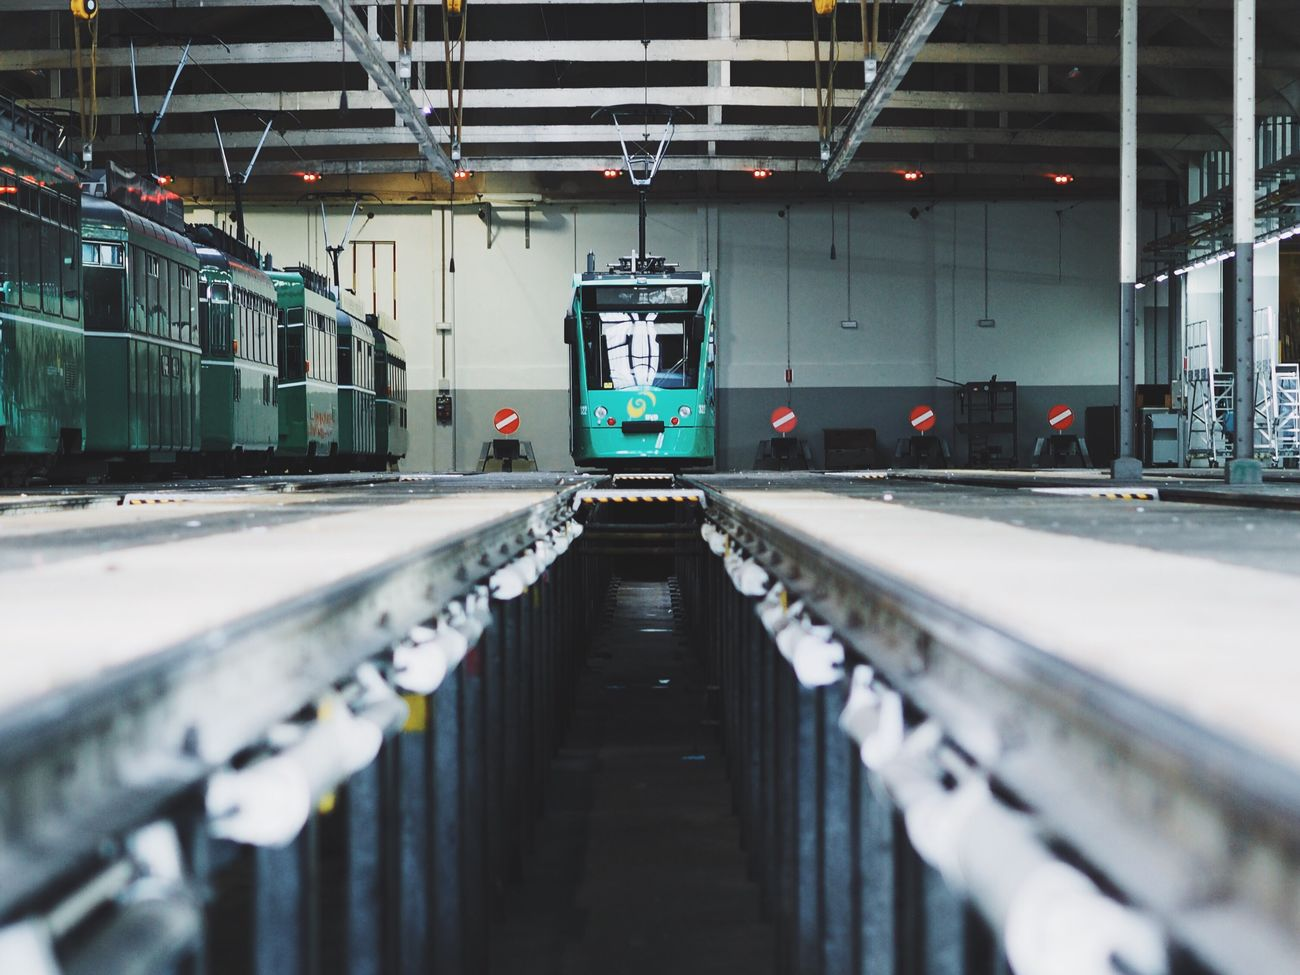 My Commute Public Transportation Tramdepot Tram Diminishing Perspective Symmetry Streetphotography No People Tram Depot Tram Stop City City Life at Basel, Switzerland Showcase June EyeEm X Mashable - My Commute